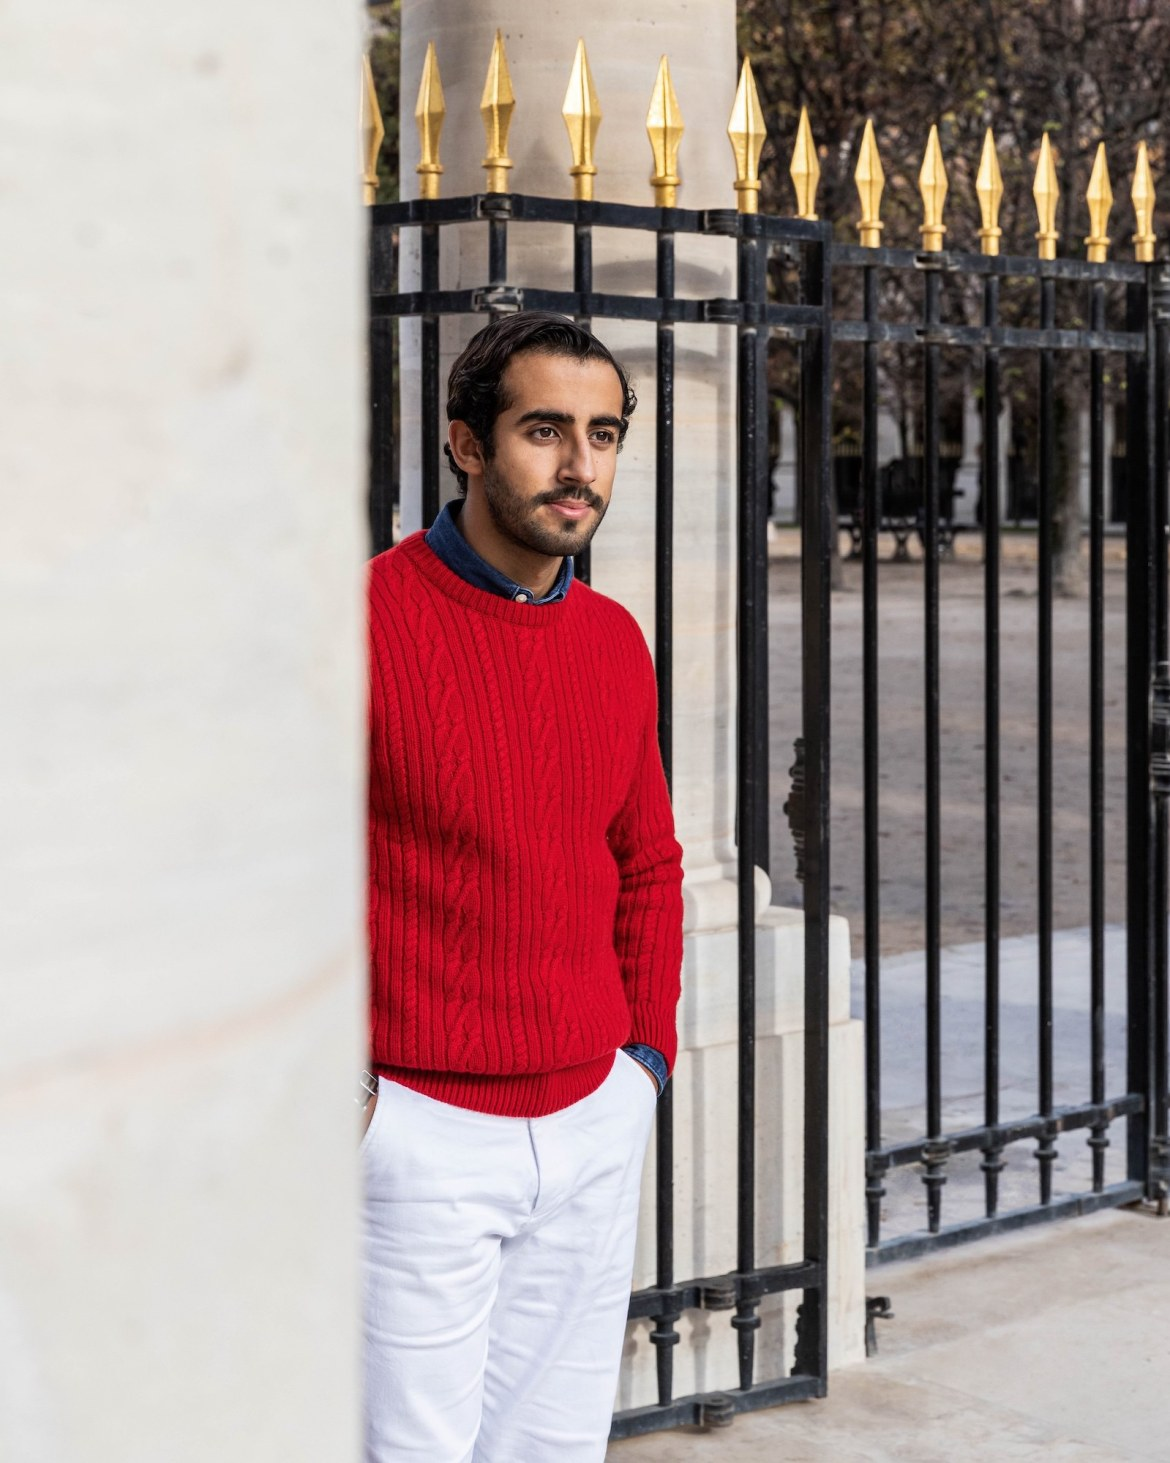 Farid Boumayla Verygoodlord